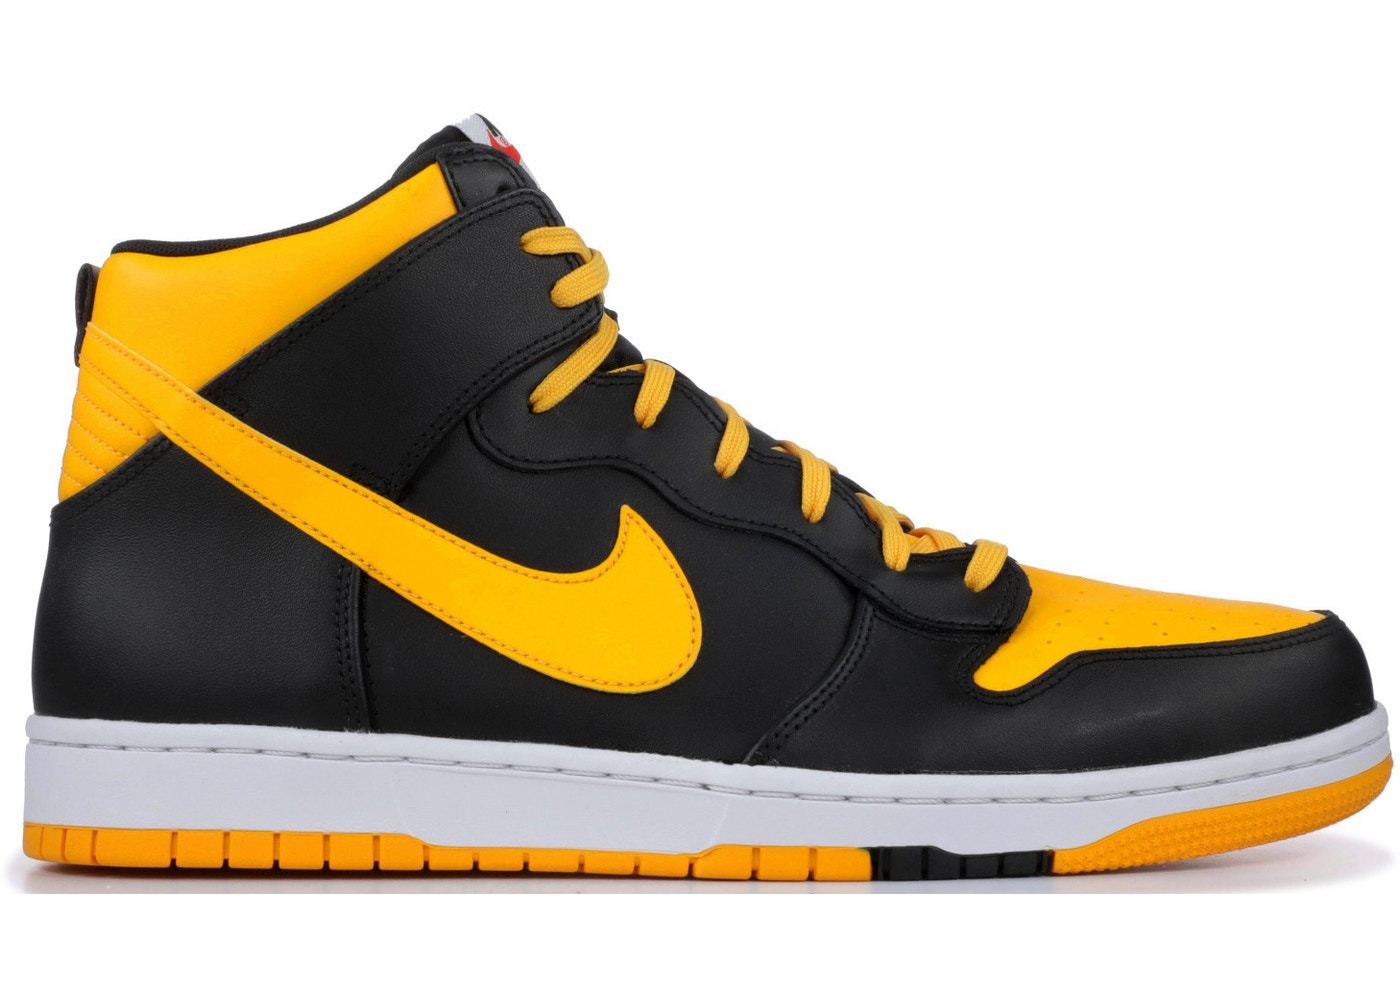 new york 4652b 8daee Nike Dunk Cmft University Gold Black-White - 705434-700